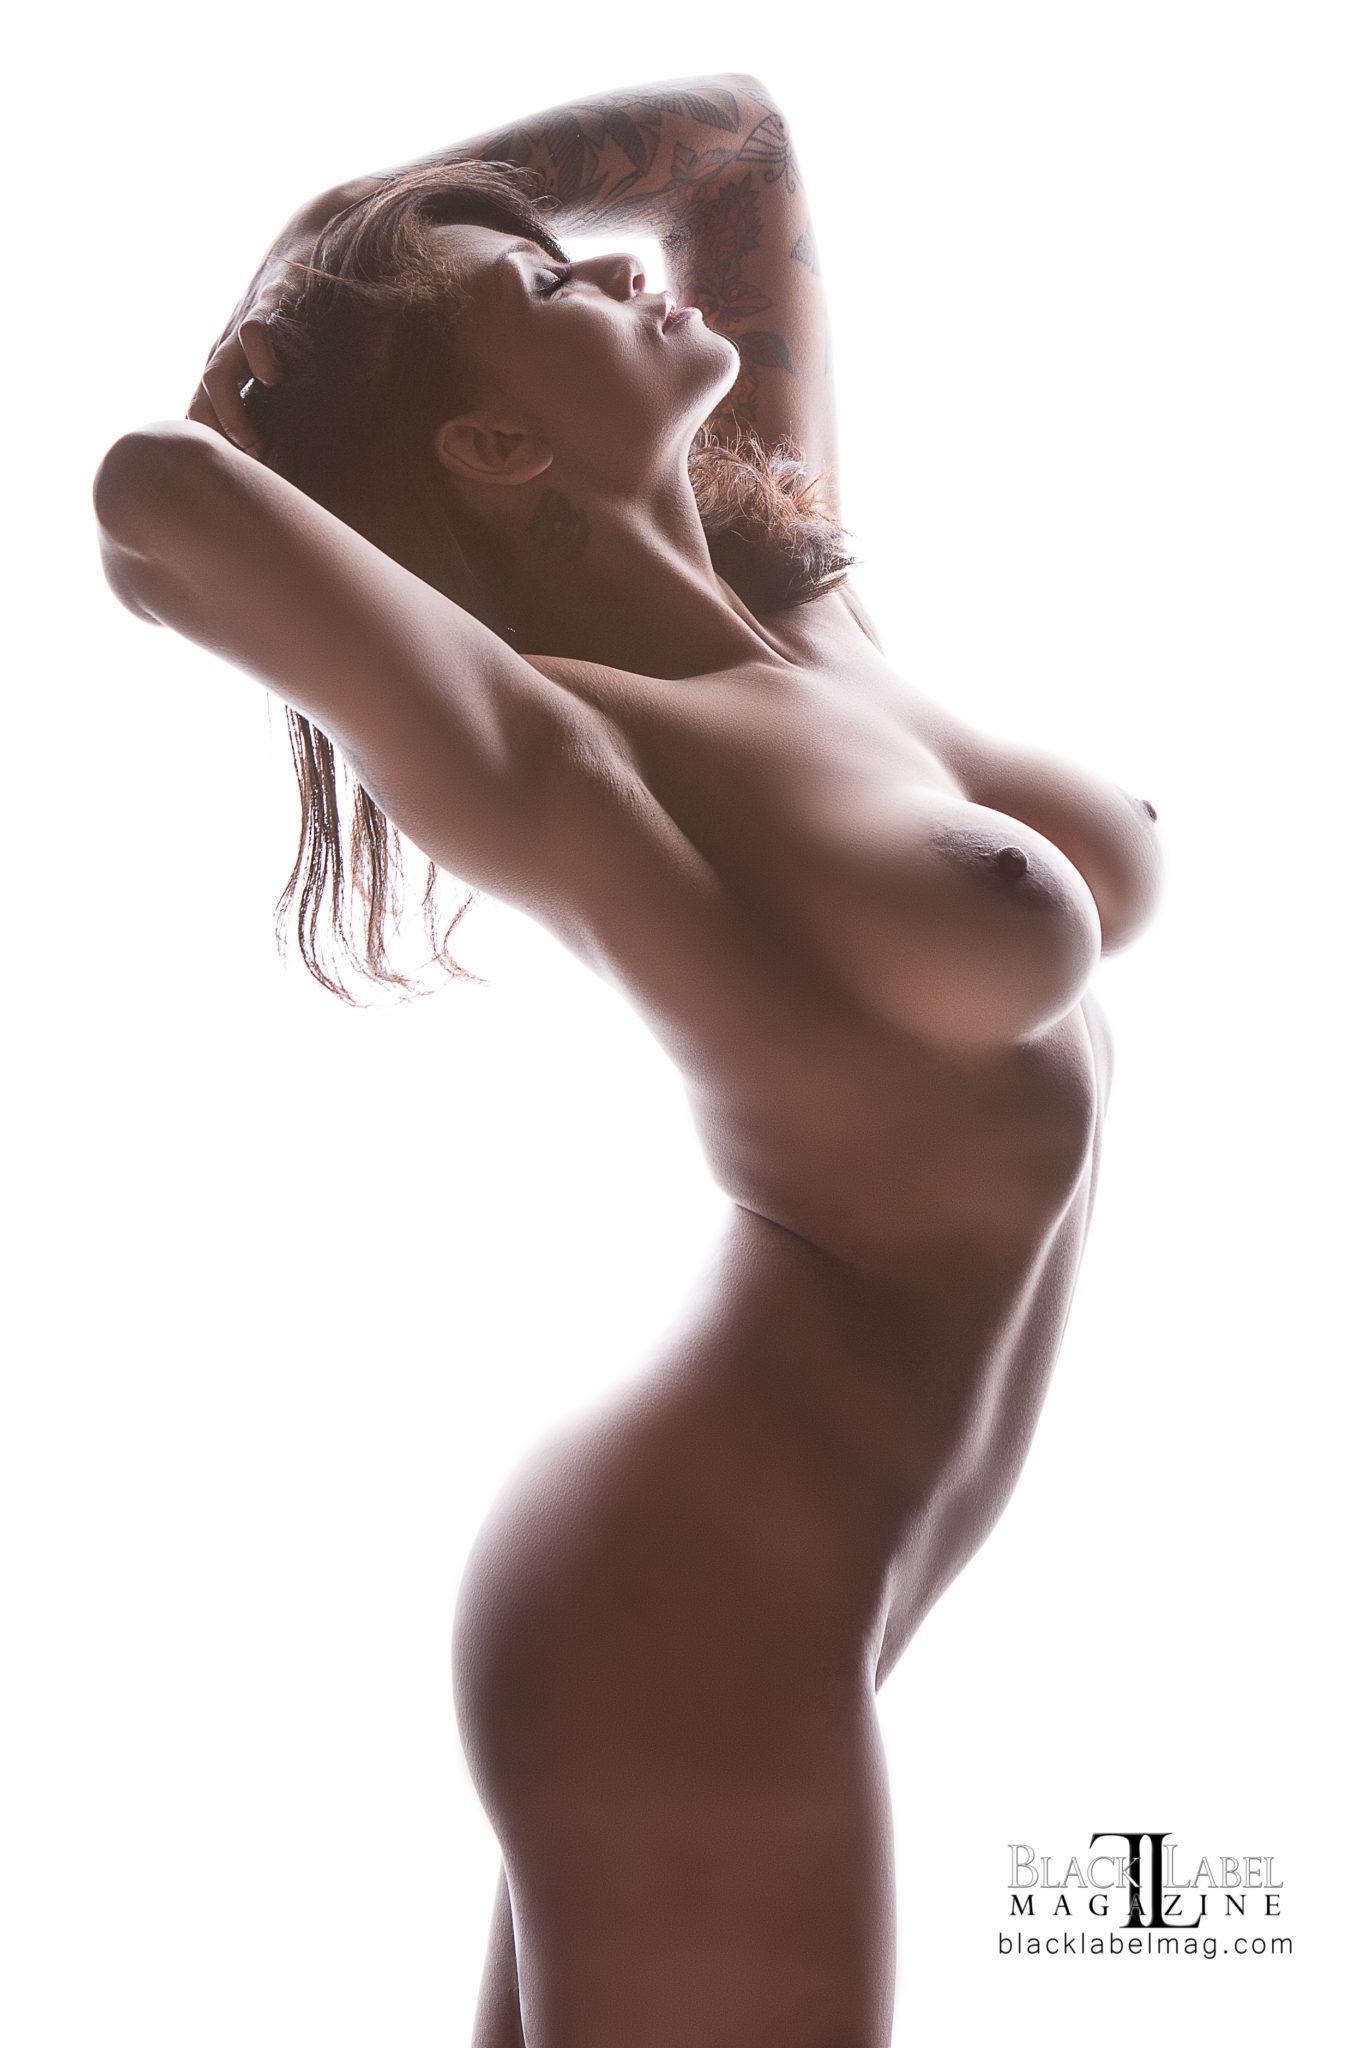 busty girls, ebony nudes, black label magazine, sandria dore, big tits, busty milf, black milf, hot babes nude, nude art, sexy ladies naked